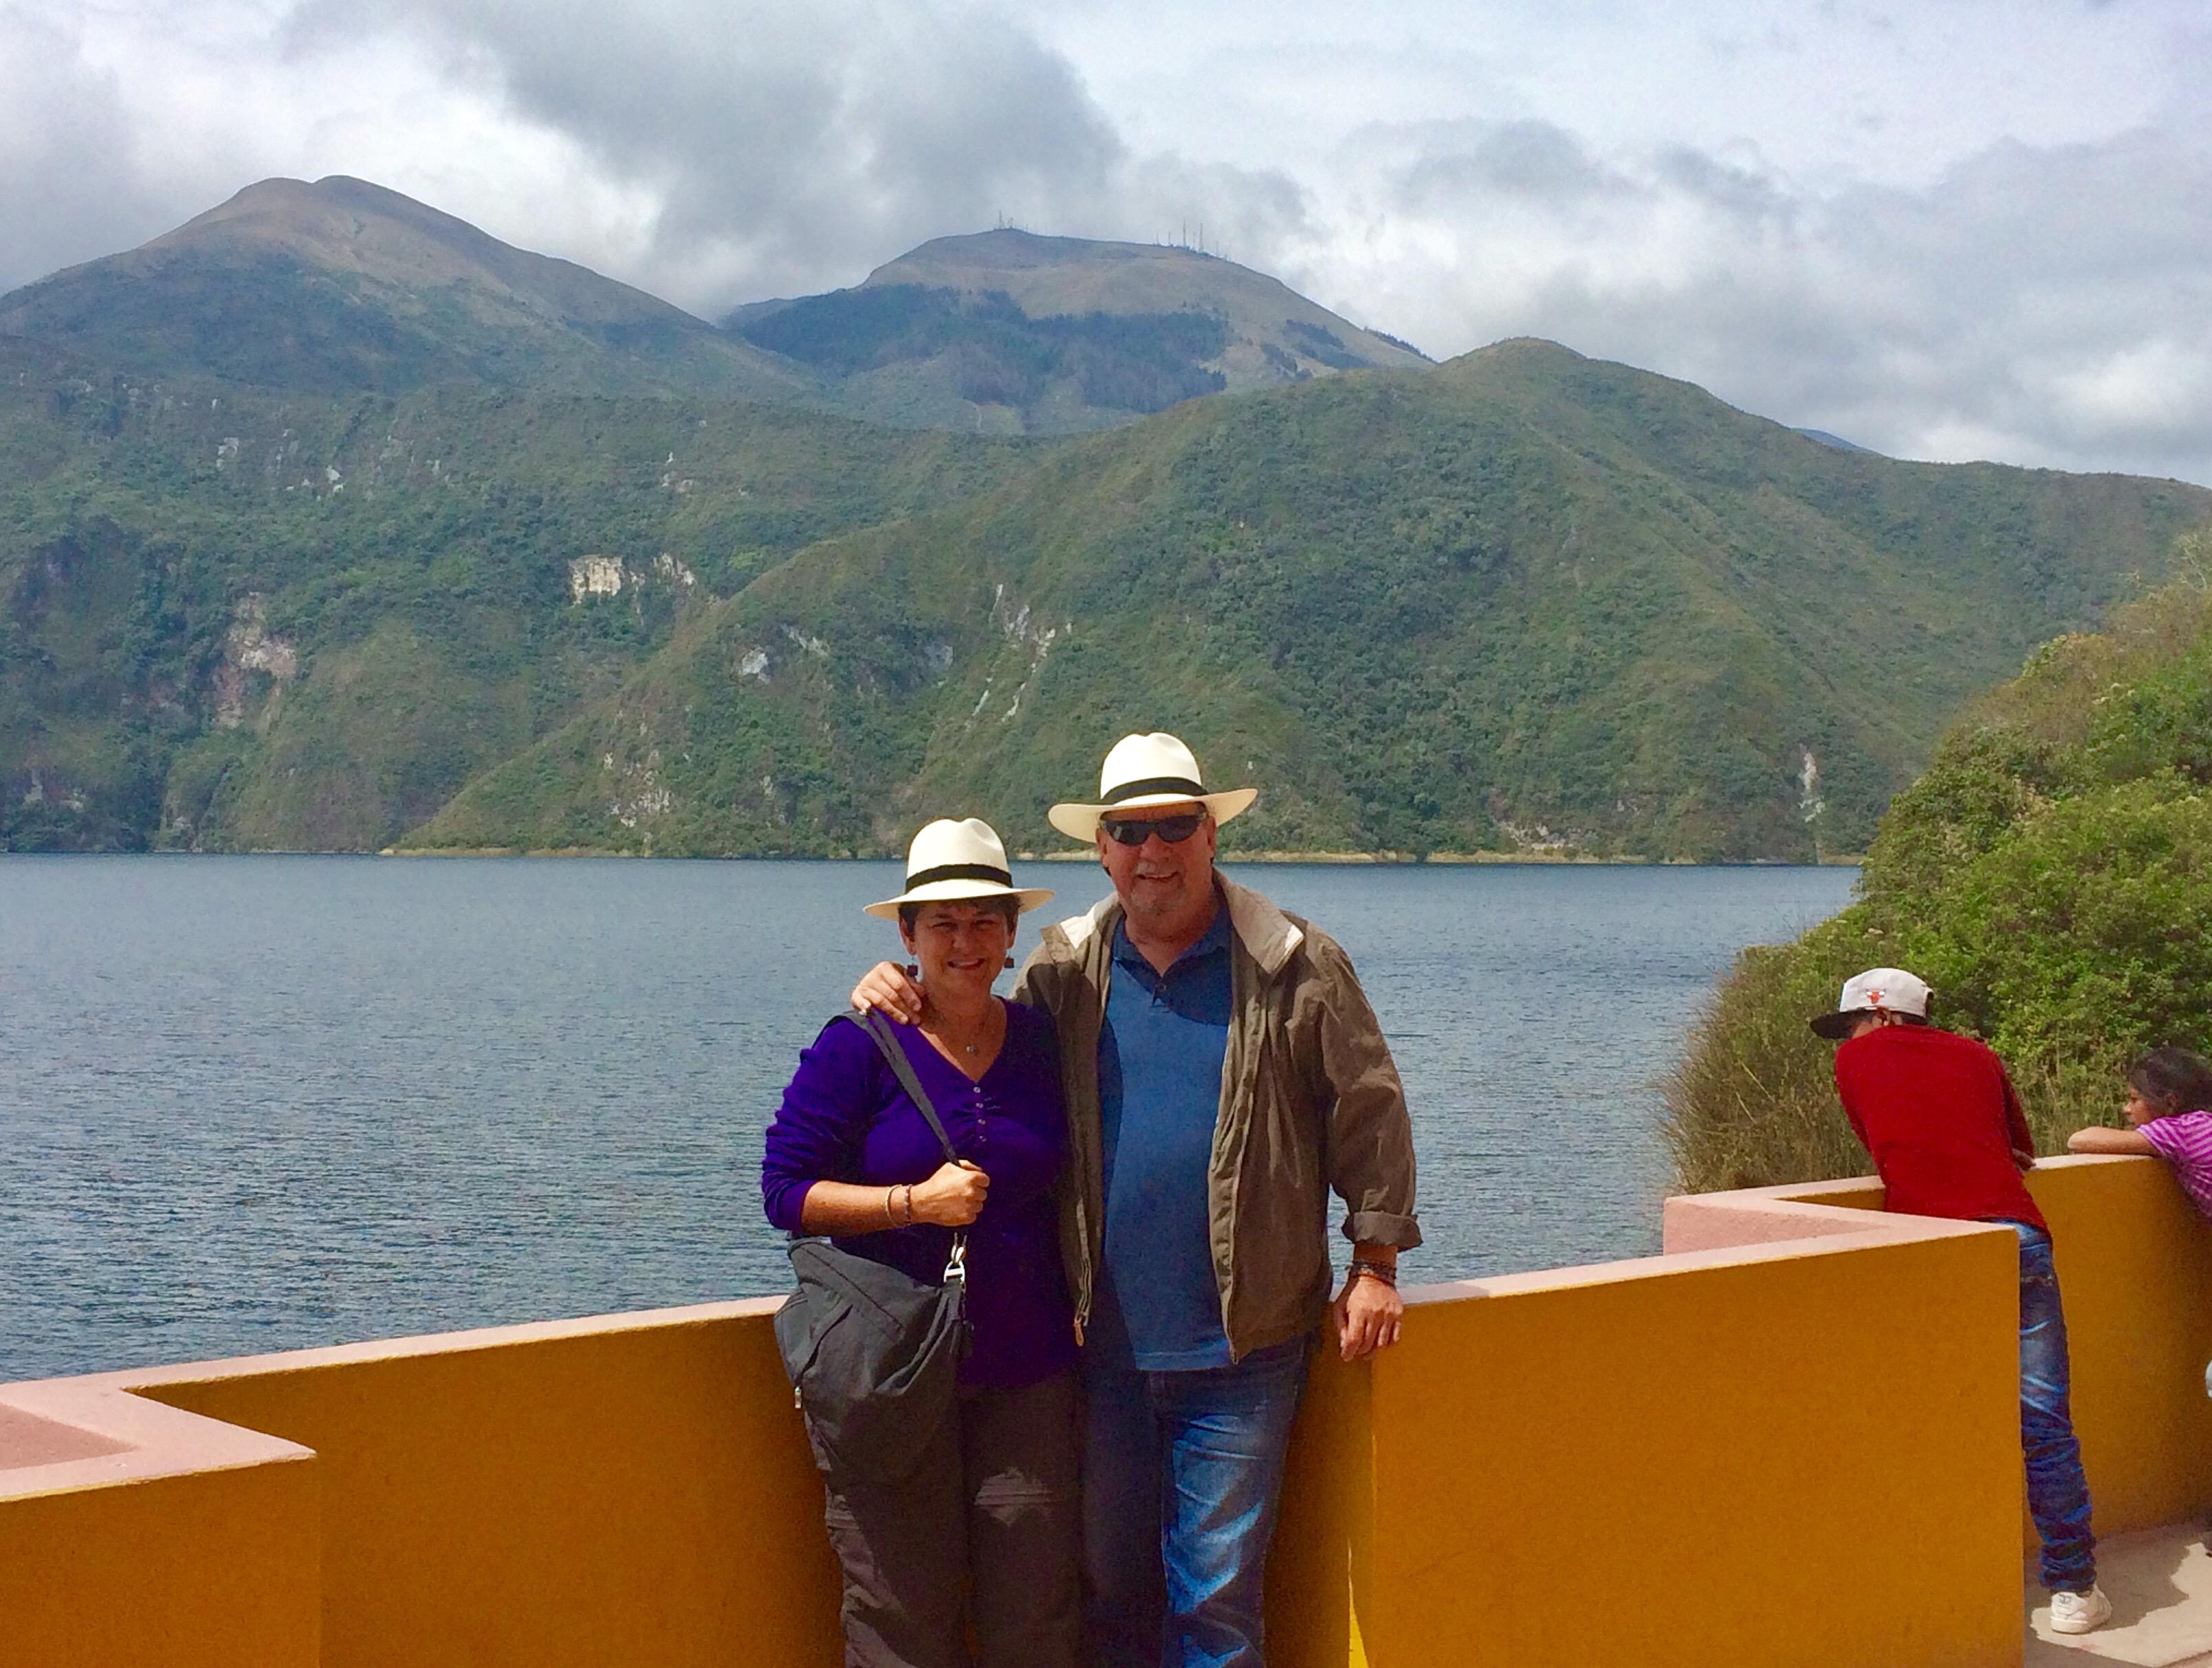 "Lago-Cuicocha ""Panama"" Hats and Hot Springs: Two Day/Overnight Trips Out of Quito, Ecuador Ecuador"